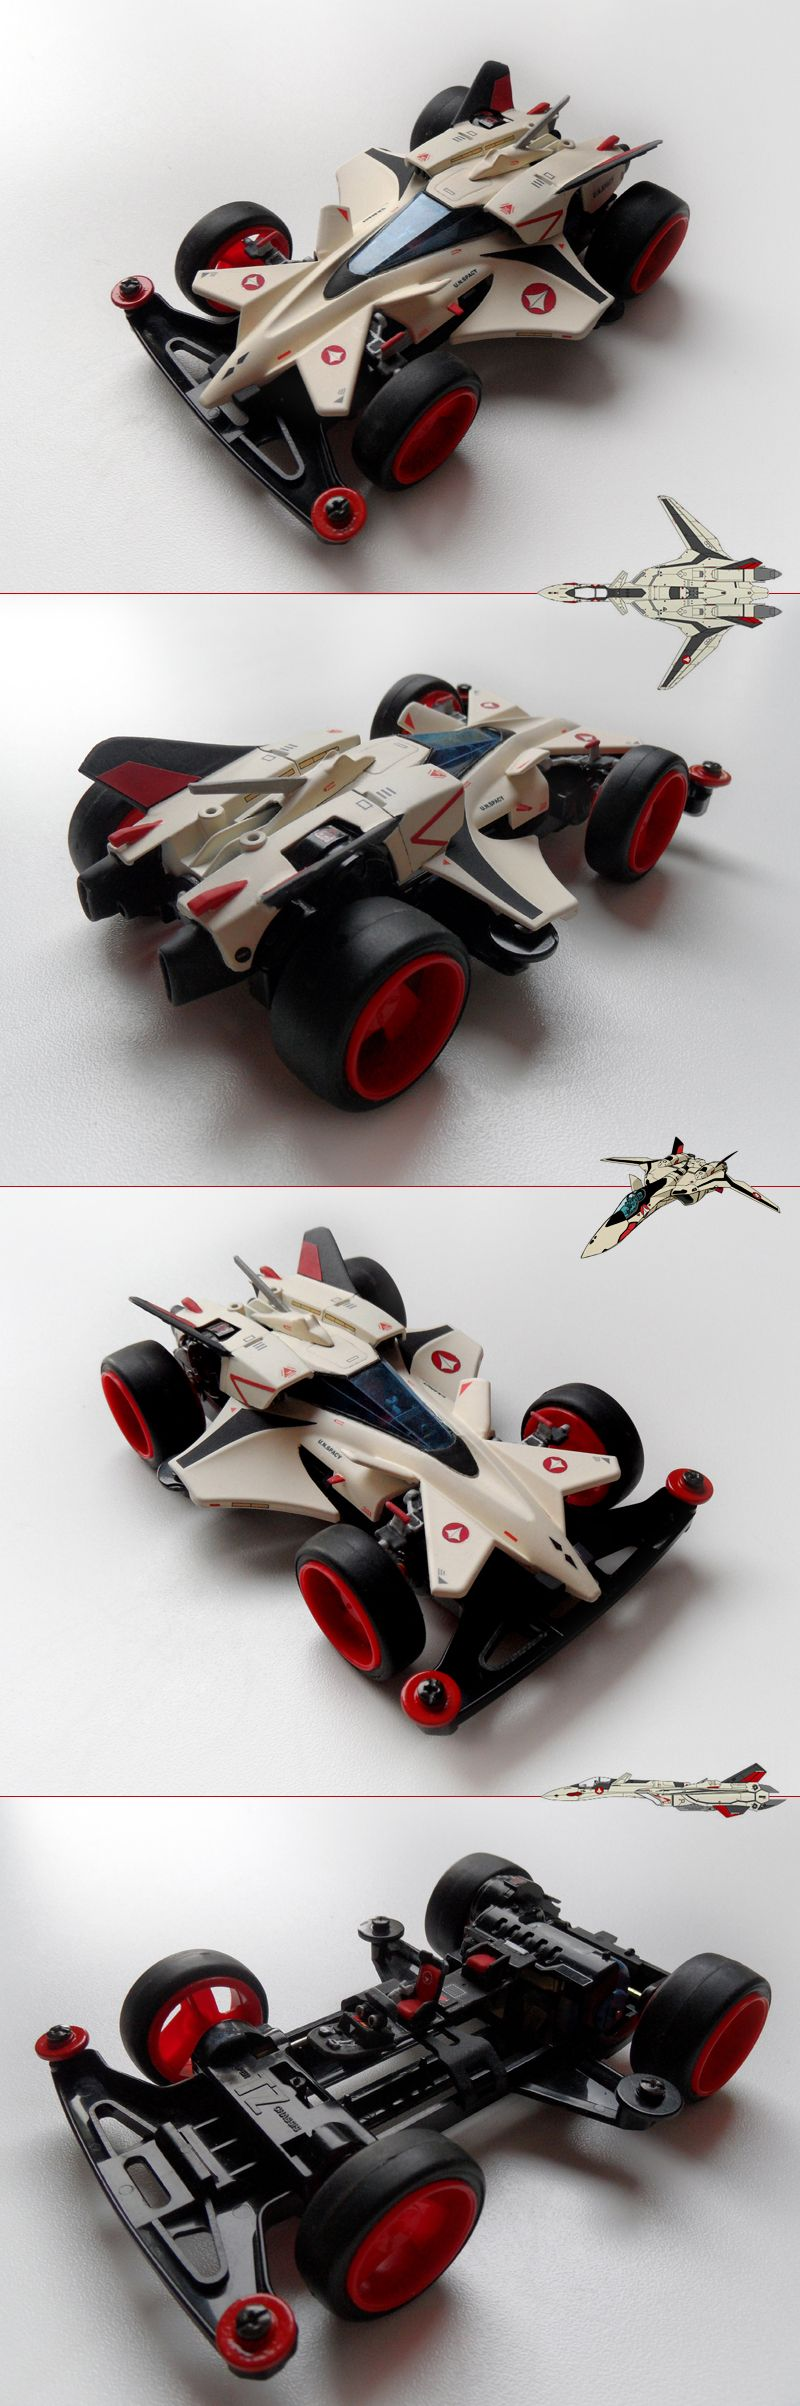 Rayhawk Gamma restored and restyled by Aran (YF-19 version)   Mini 4WD   #Mini4WD   #Tamiya   #Macross   #Robotech   #Valkyrie   #Varitech